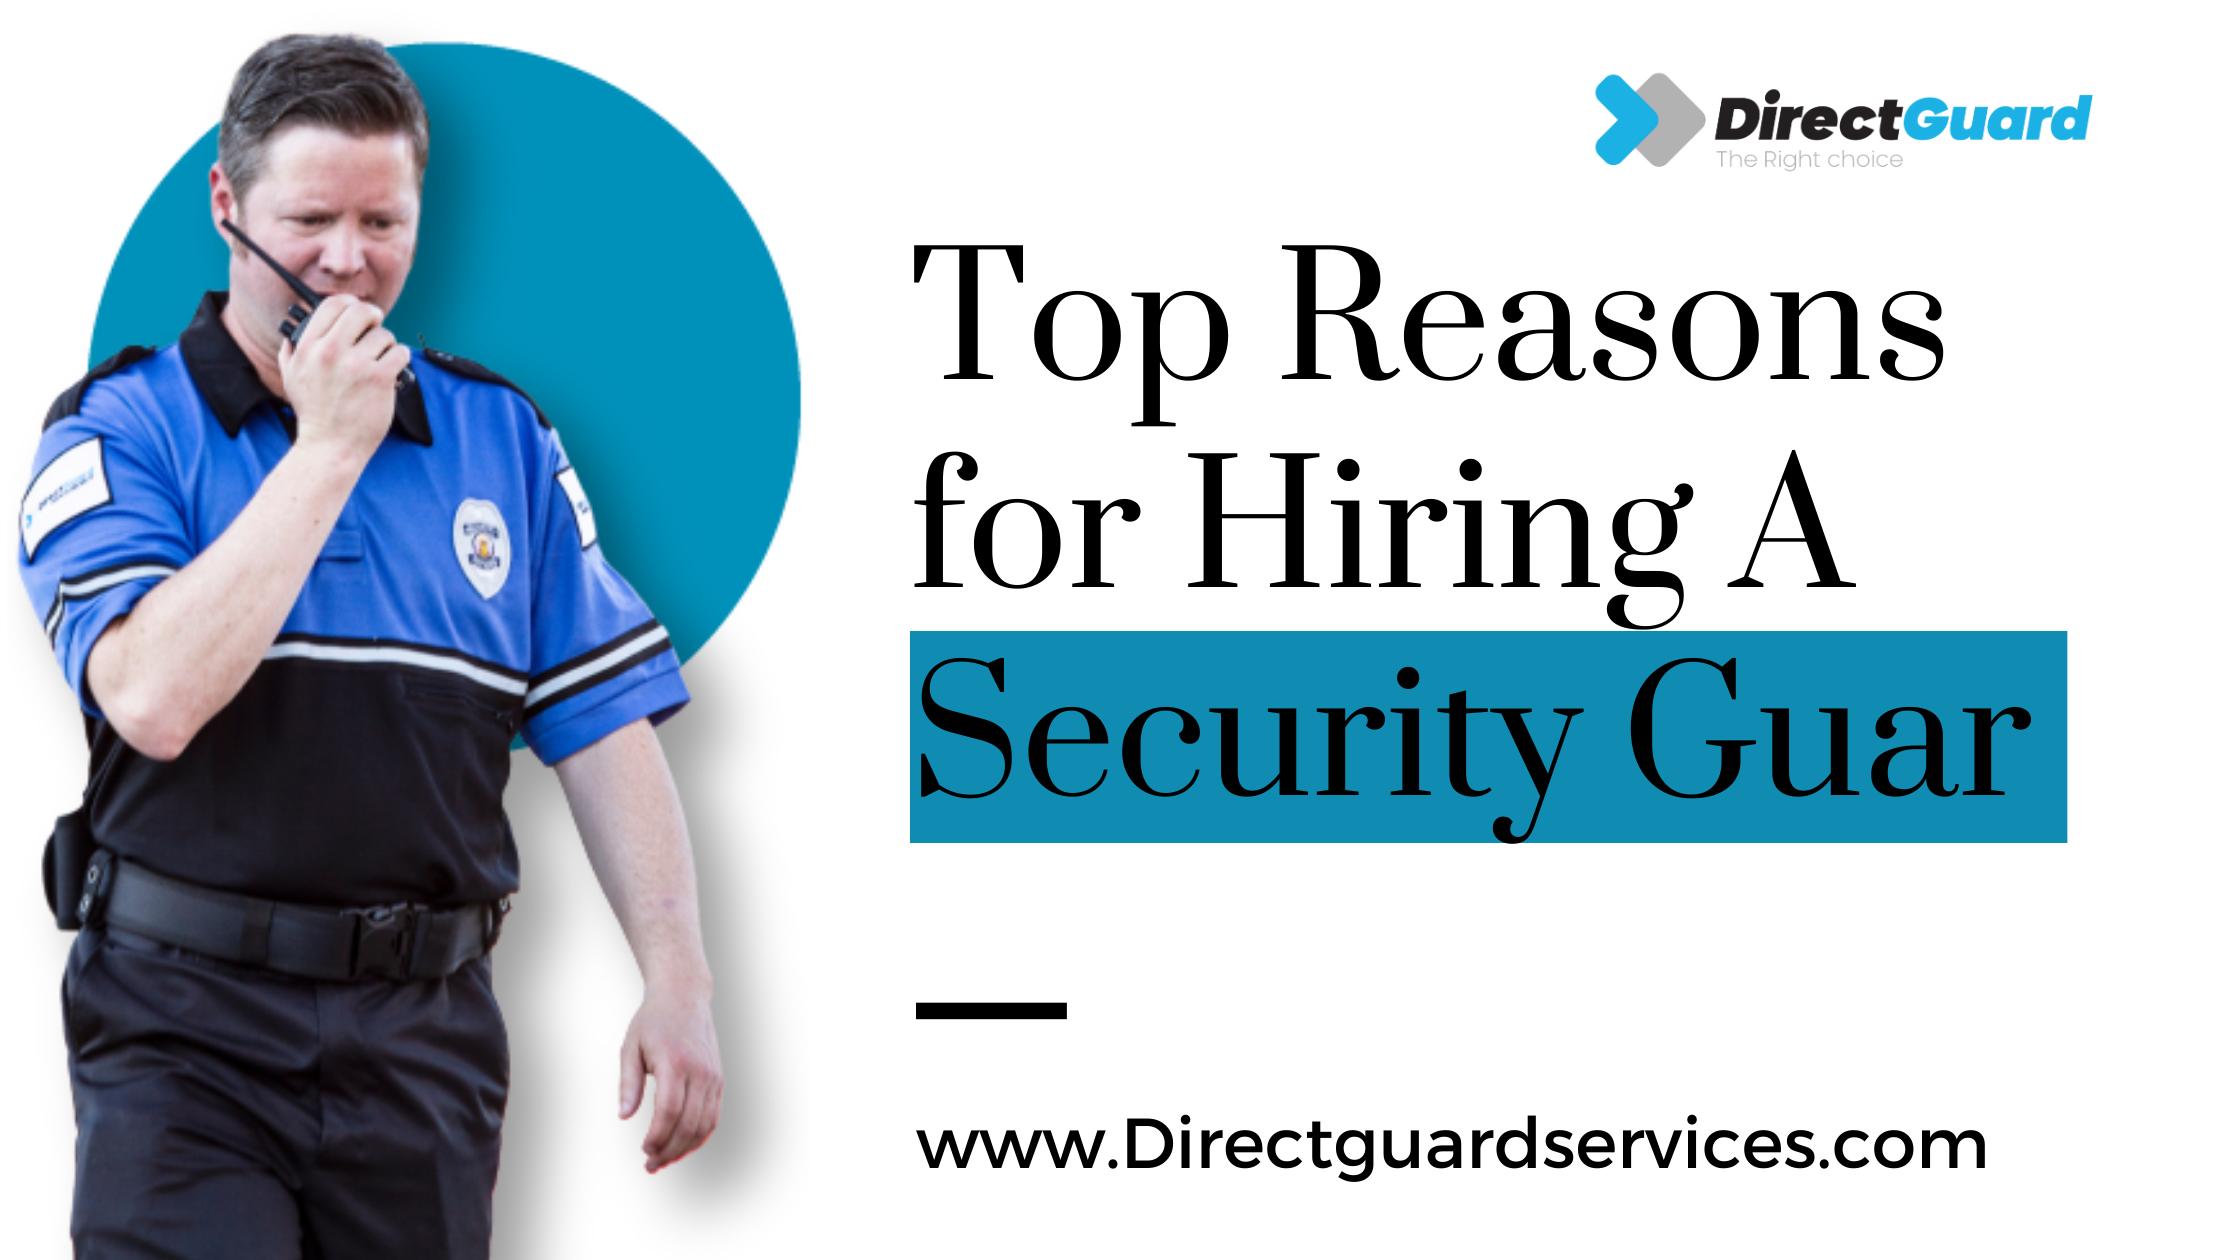 Top Reasons of Hiring A Security Guard